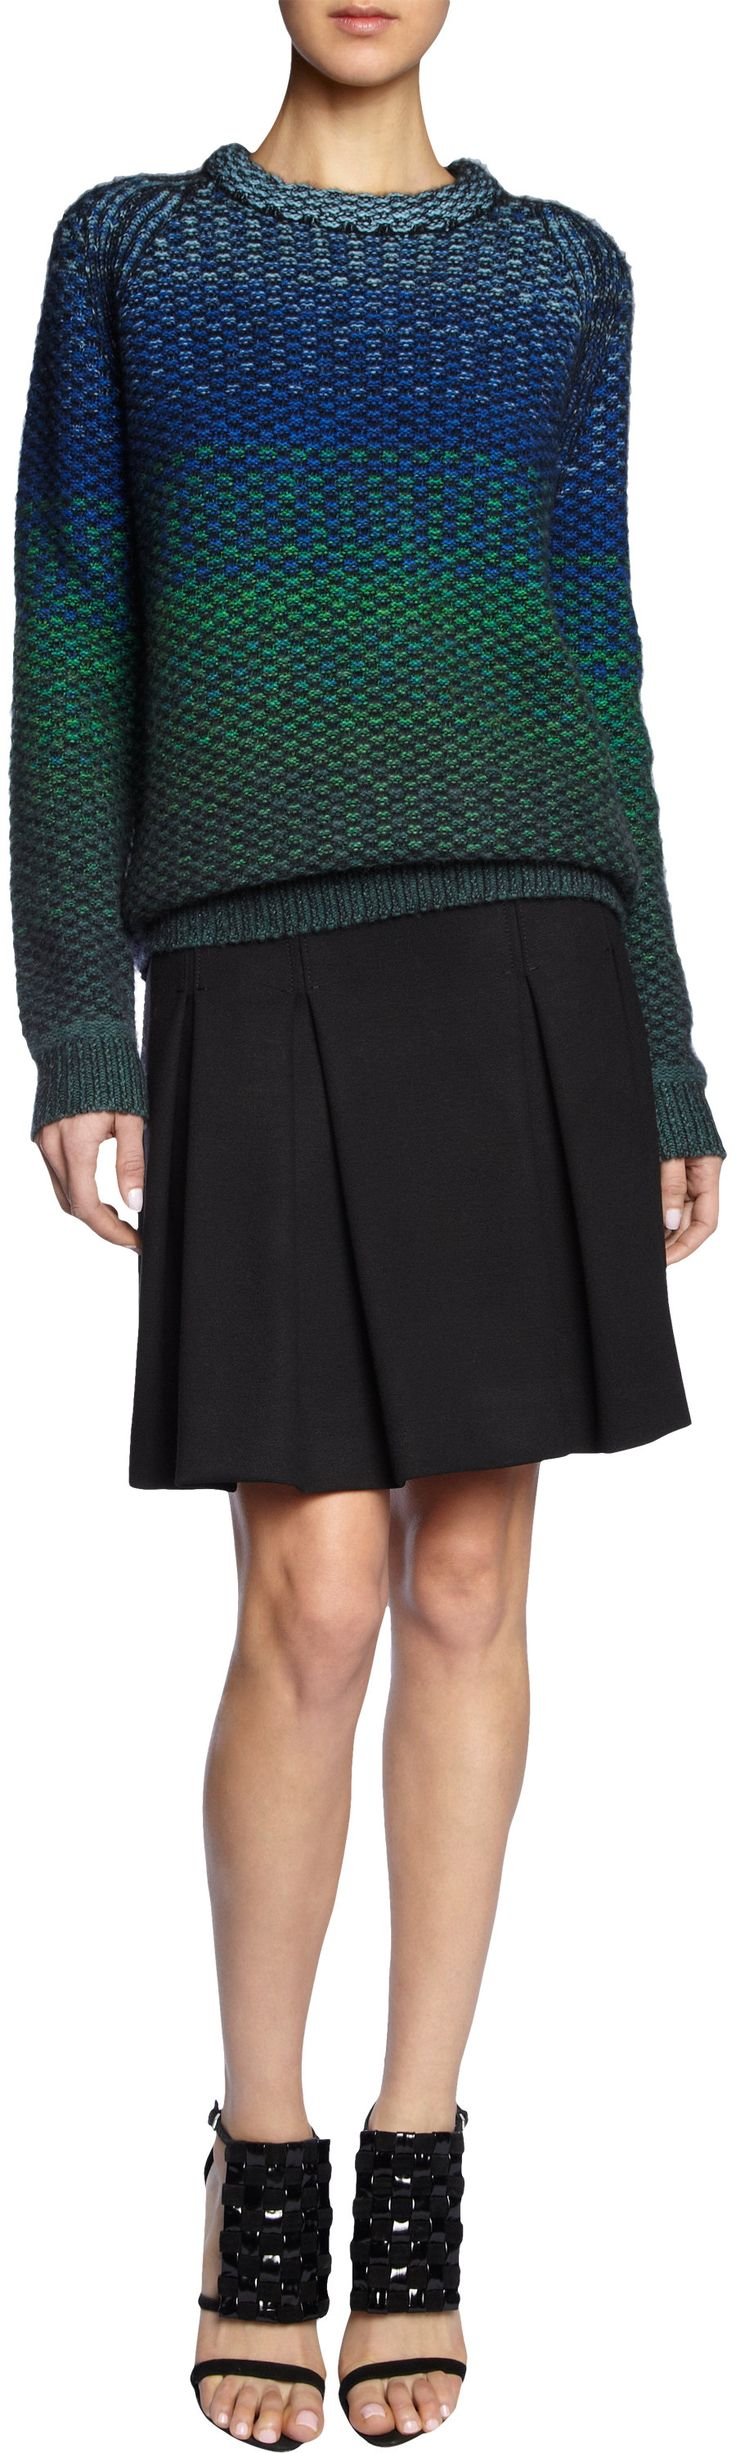 Proenza Schouler Ombre Intarsia Knit Sweater at Barneys.com